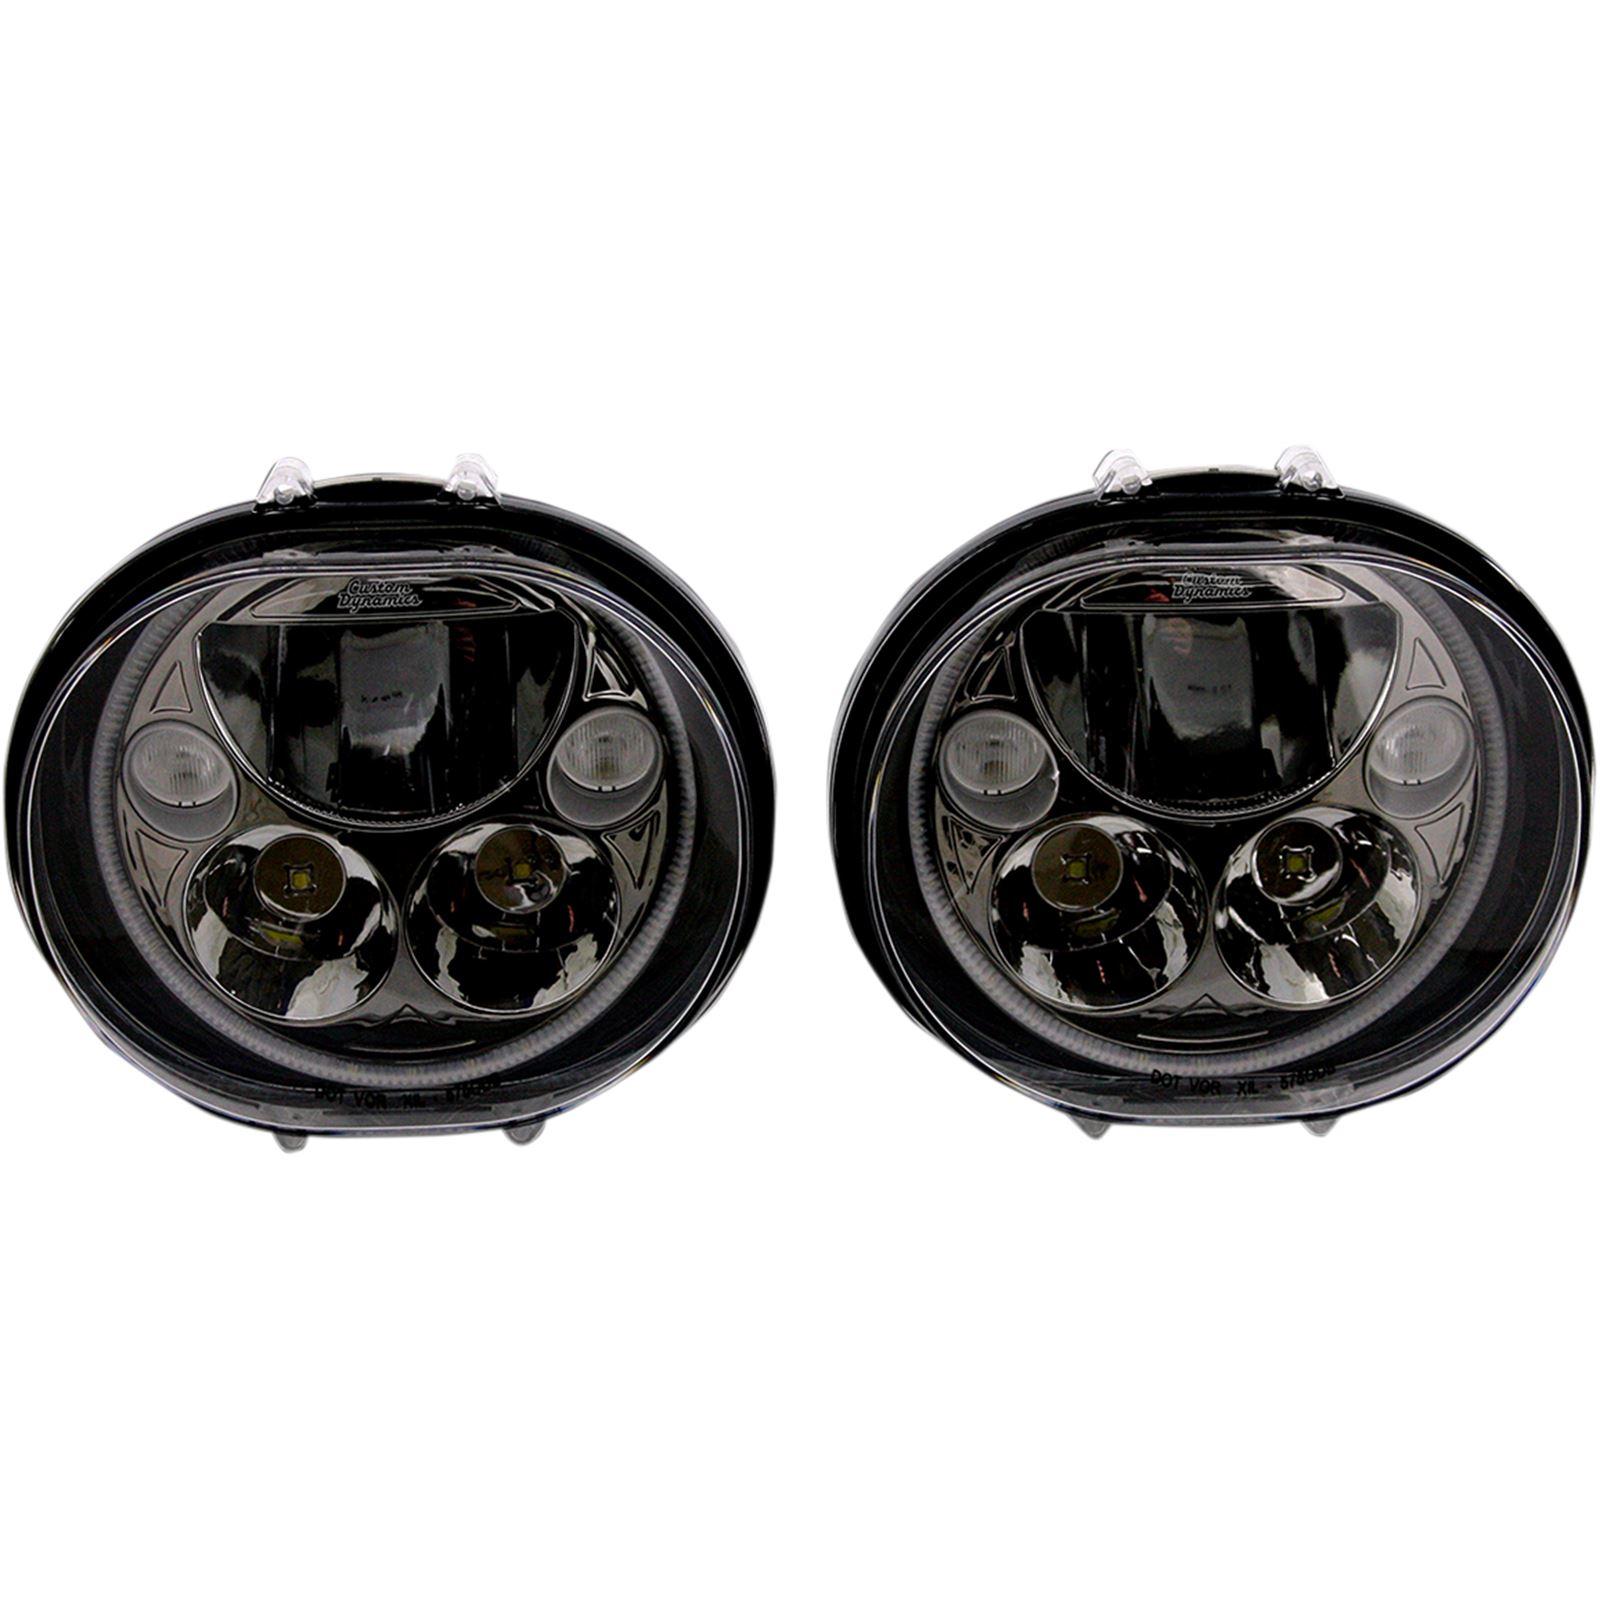 "Custom Dynamics LED Headlight - 5-3/4"" - Black - Pair"